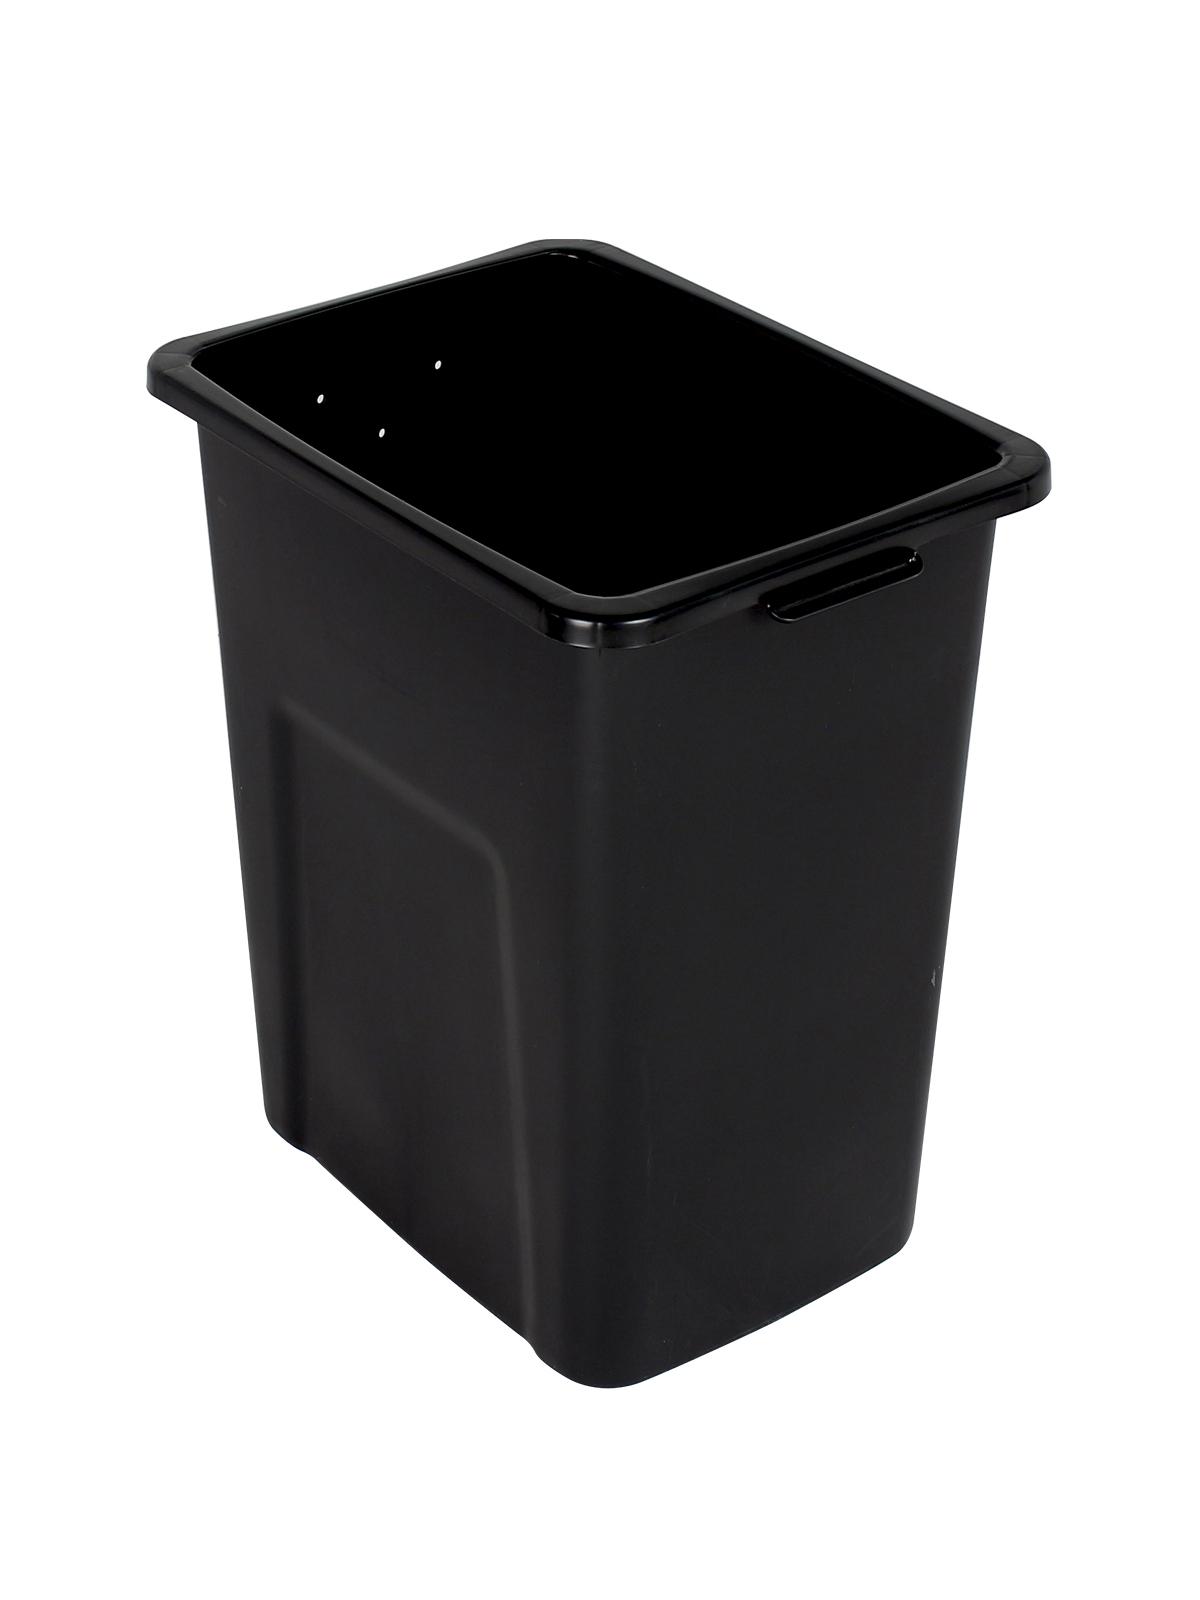 WASTE WATCHER XL - Single - Body - 24 - Black